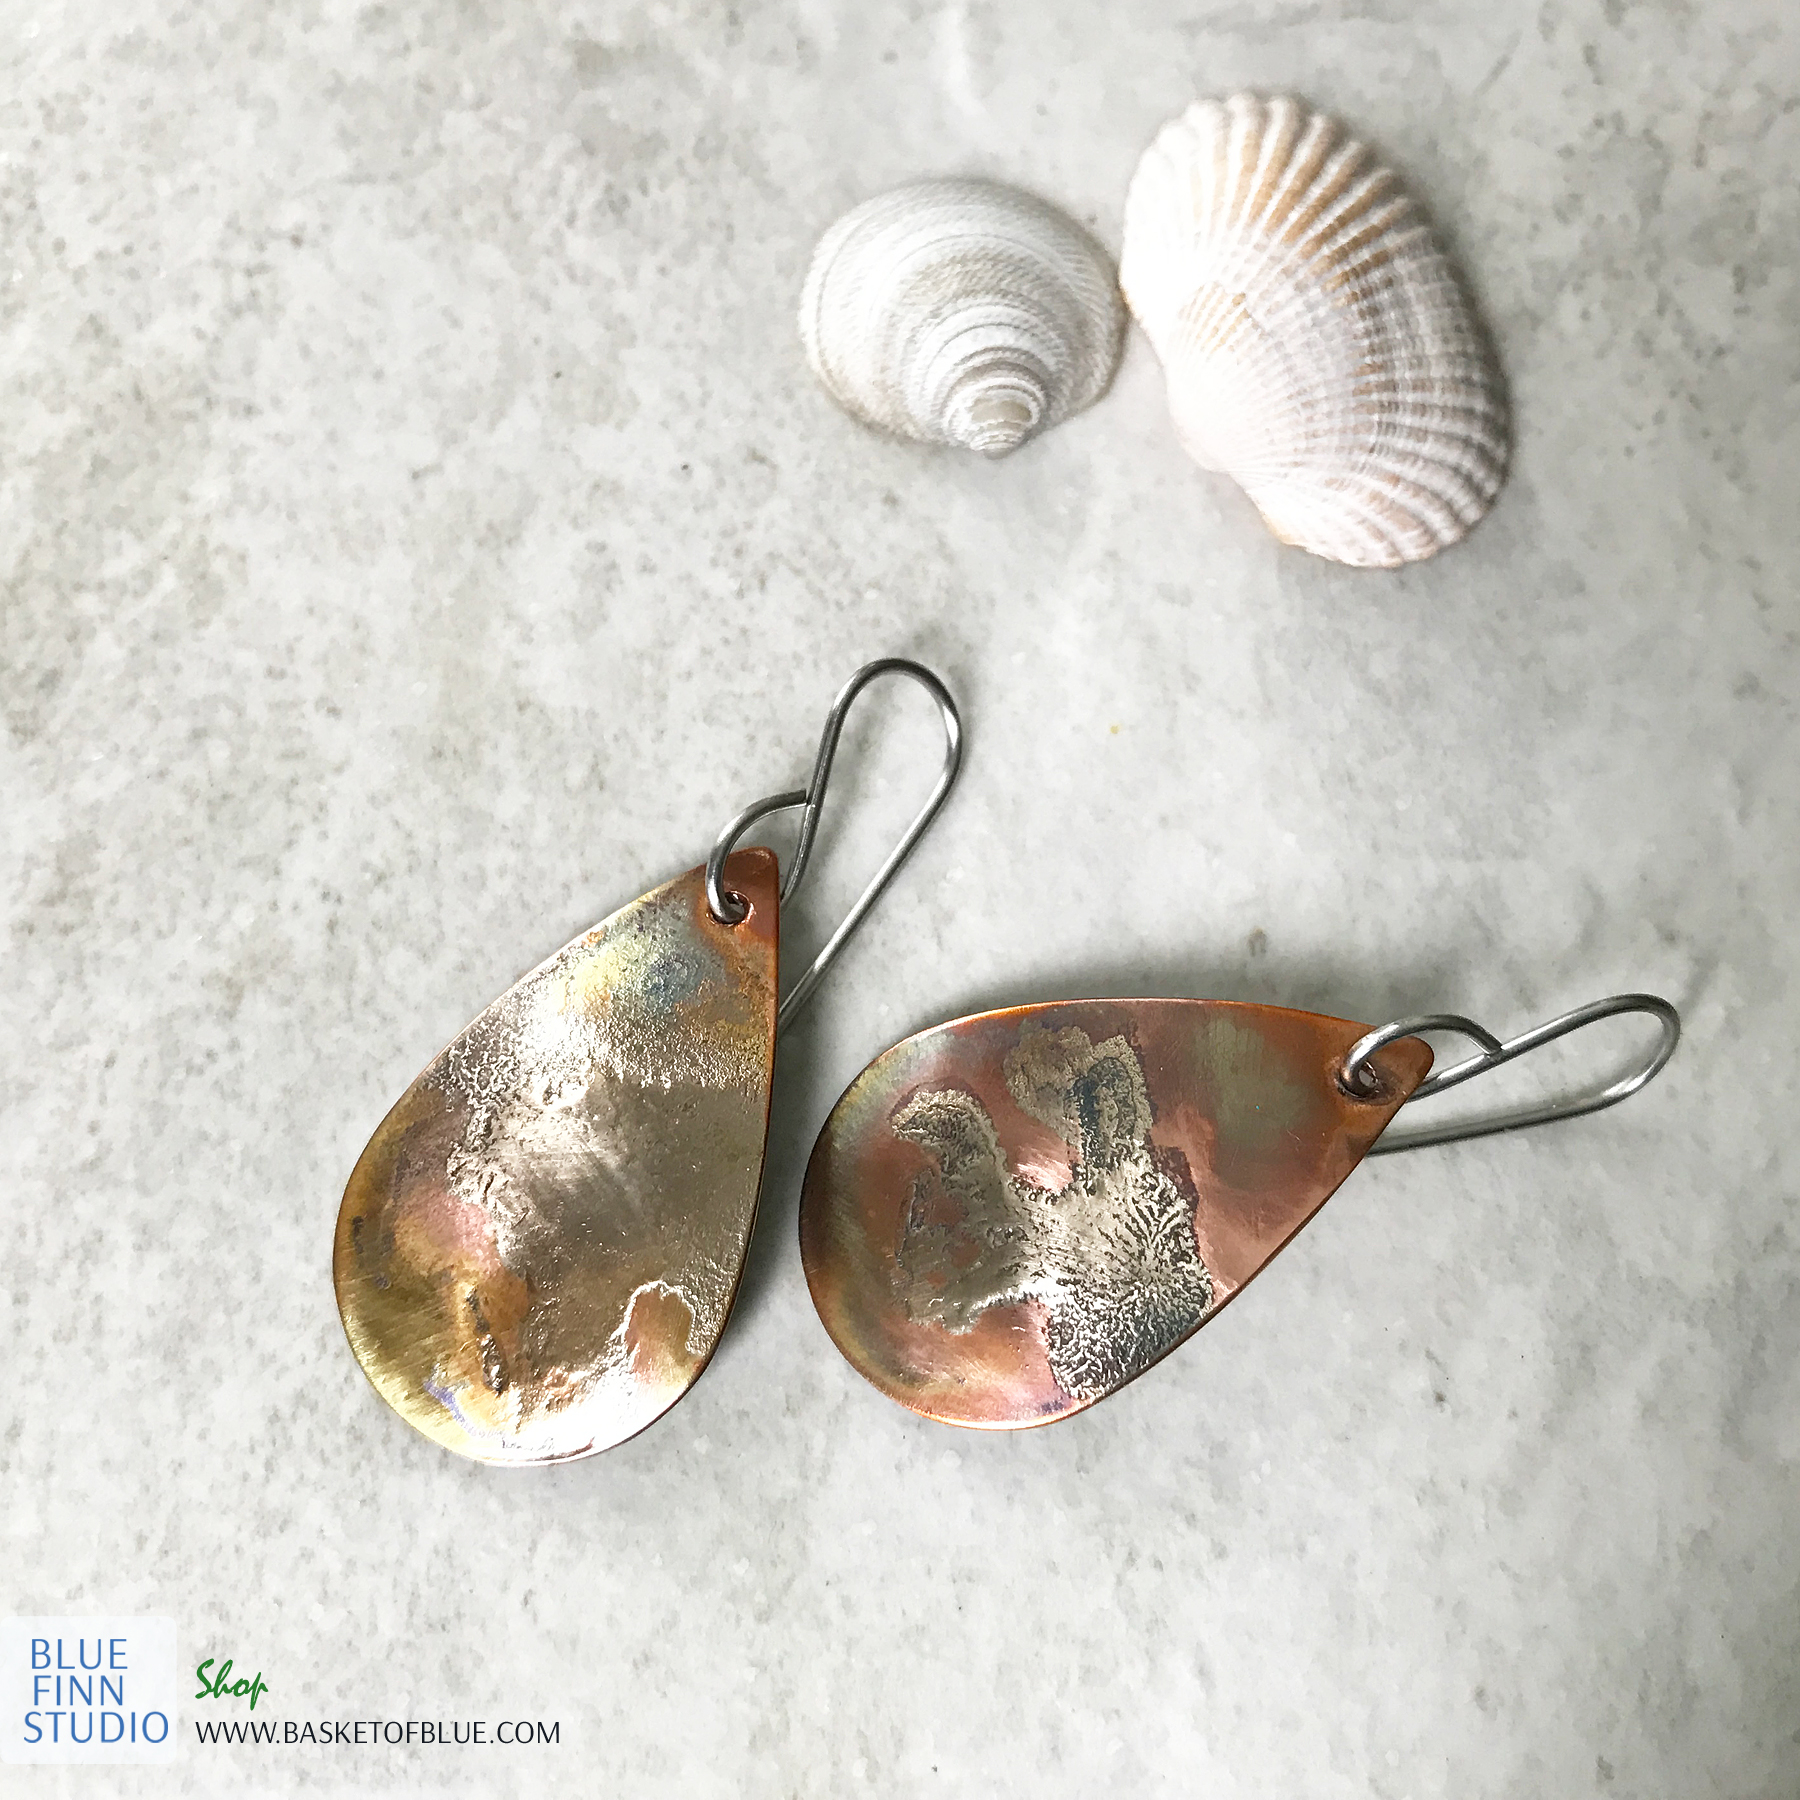 Mixed metal rustic oval earrings